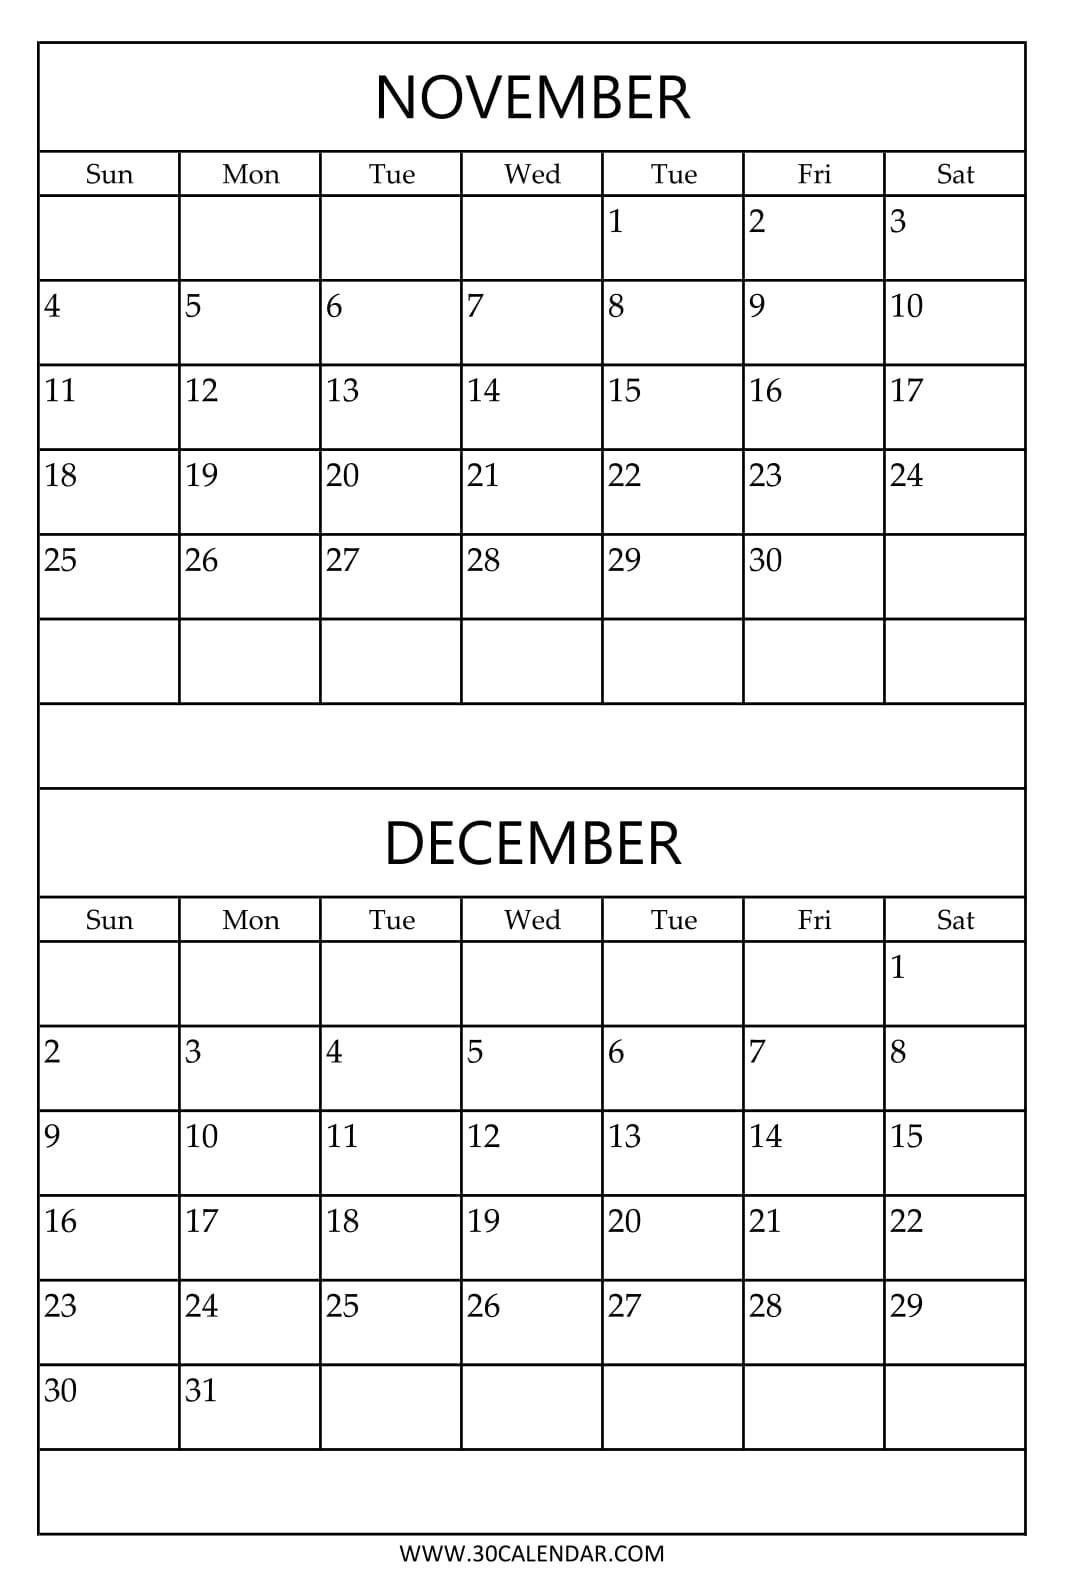 Print 2 Month Calendar | Thekpark-Hadong